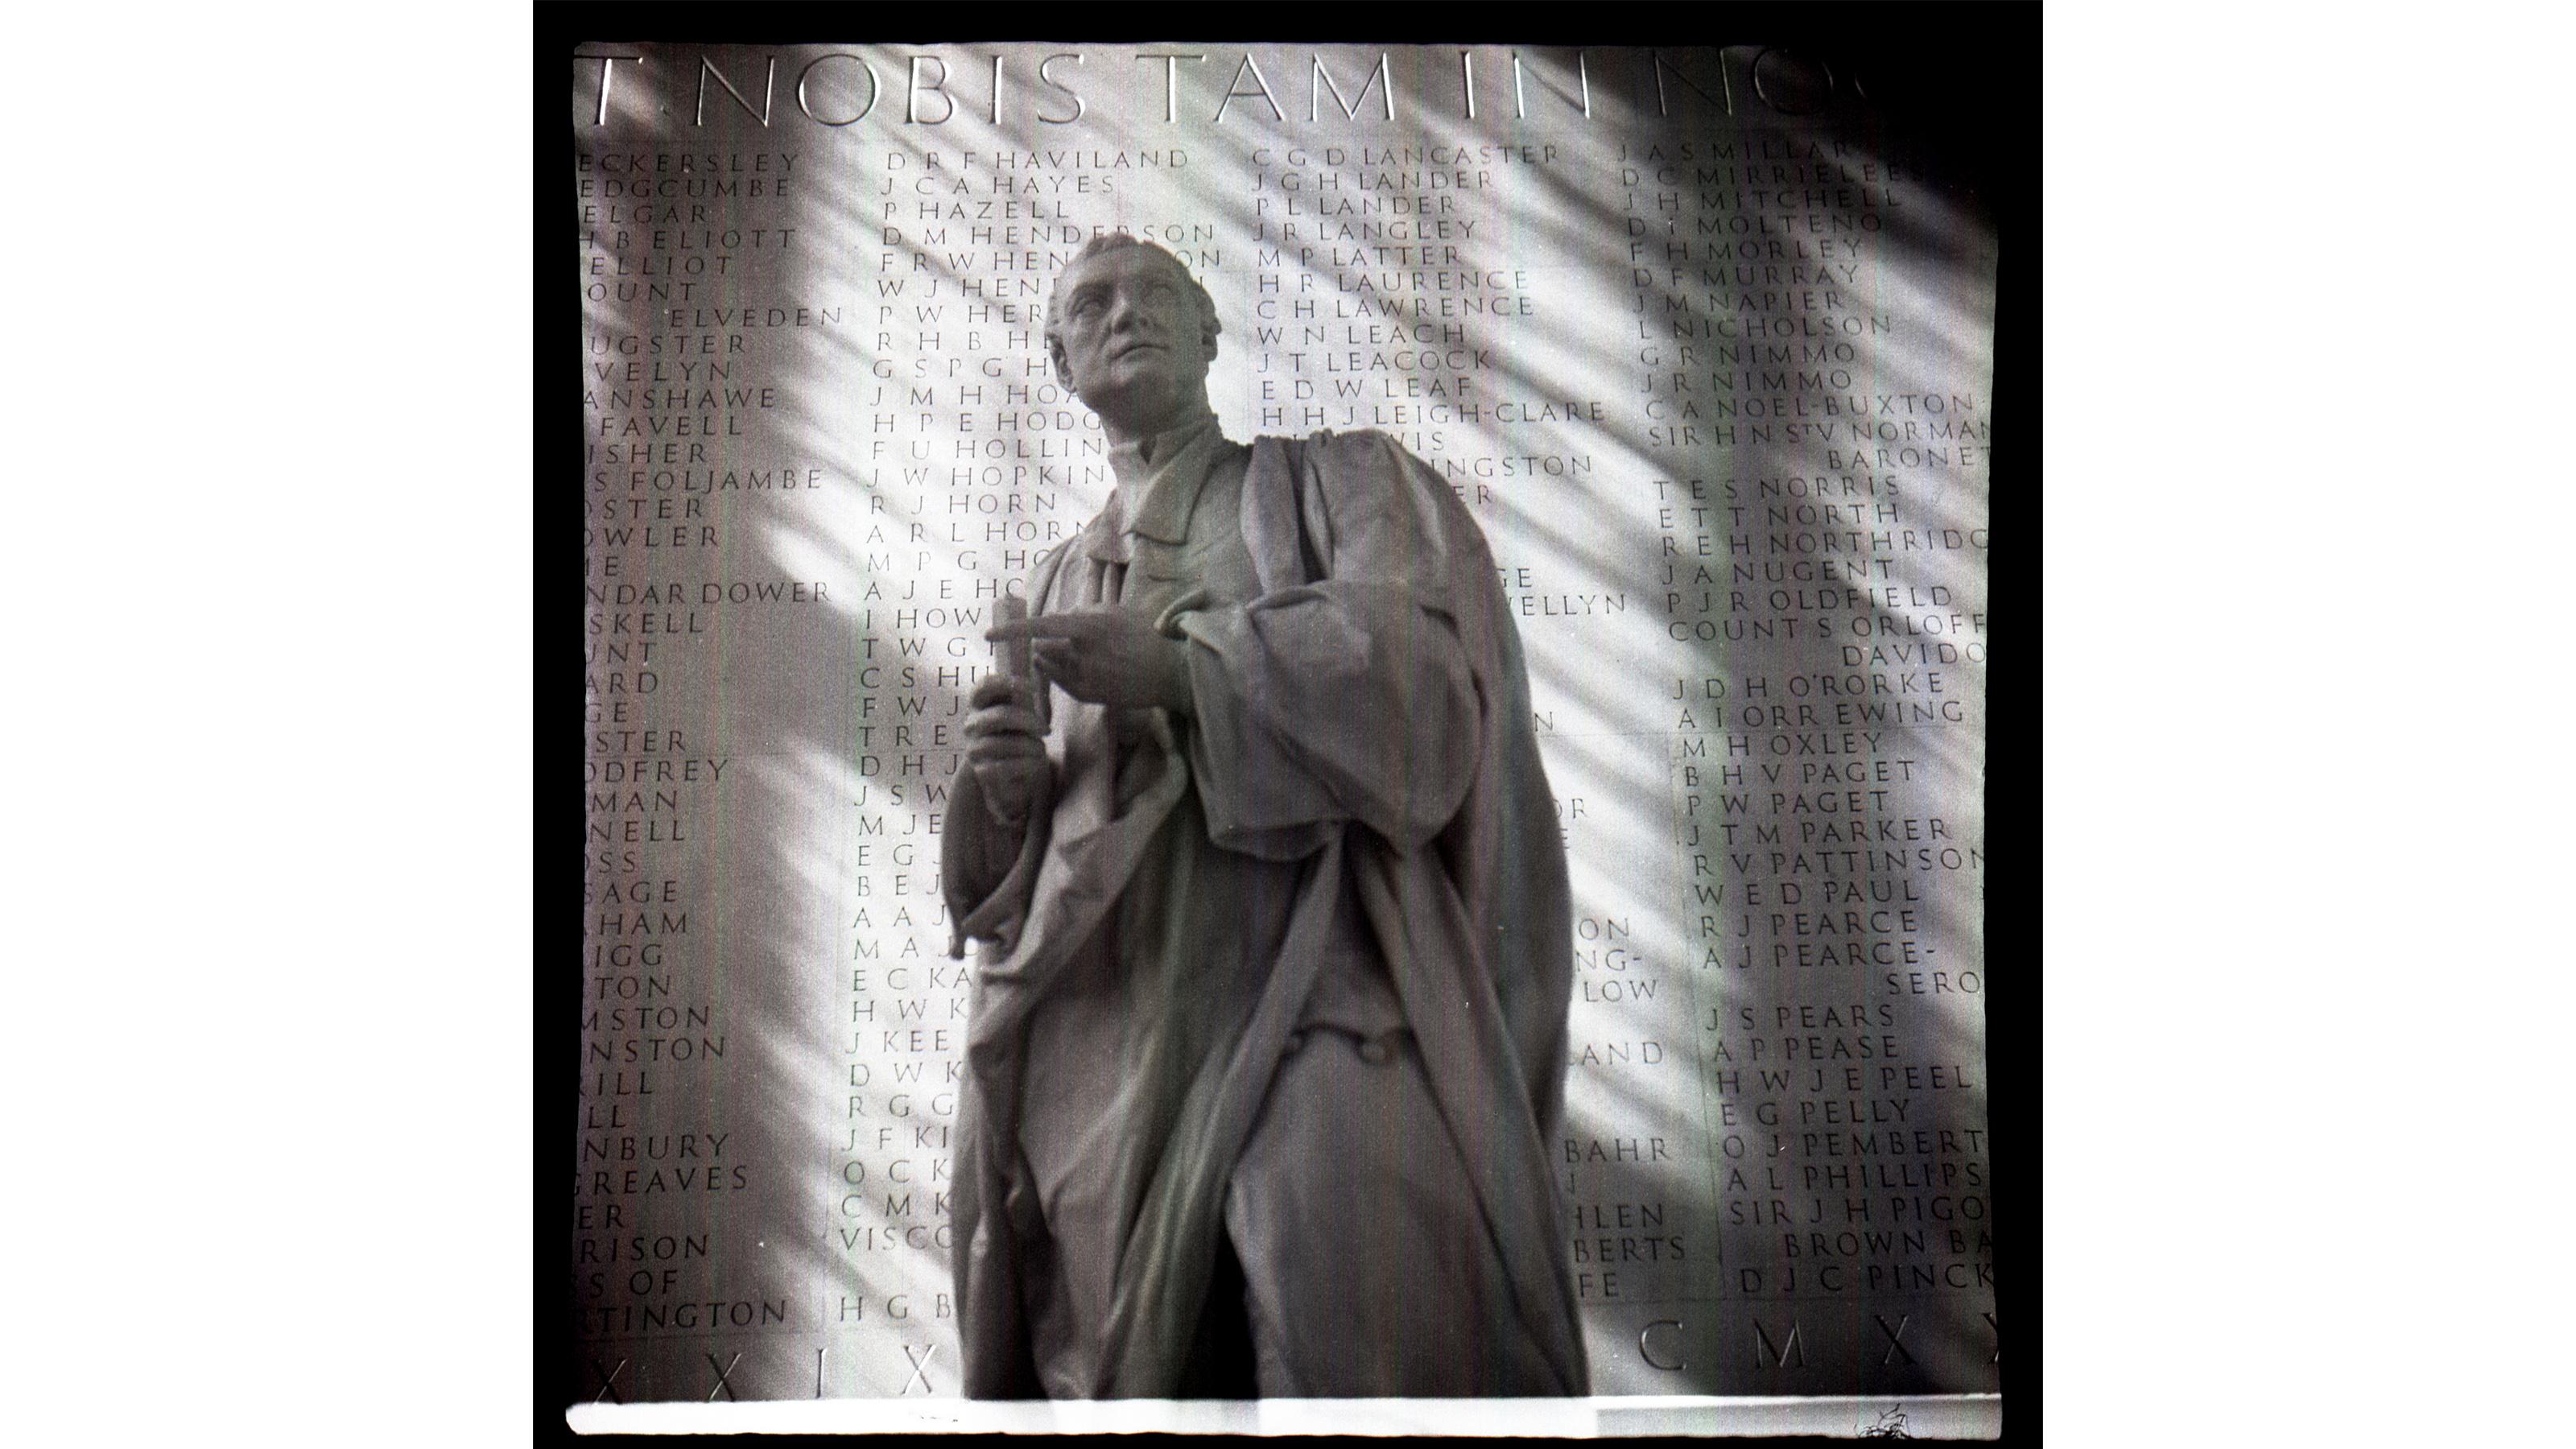 A Roman statue shot using the Purma Special camera